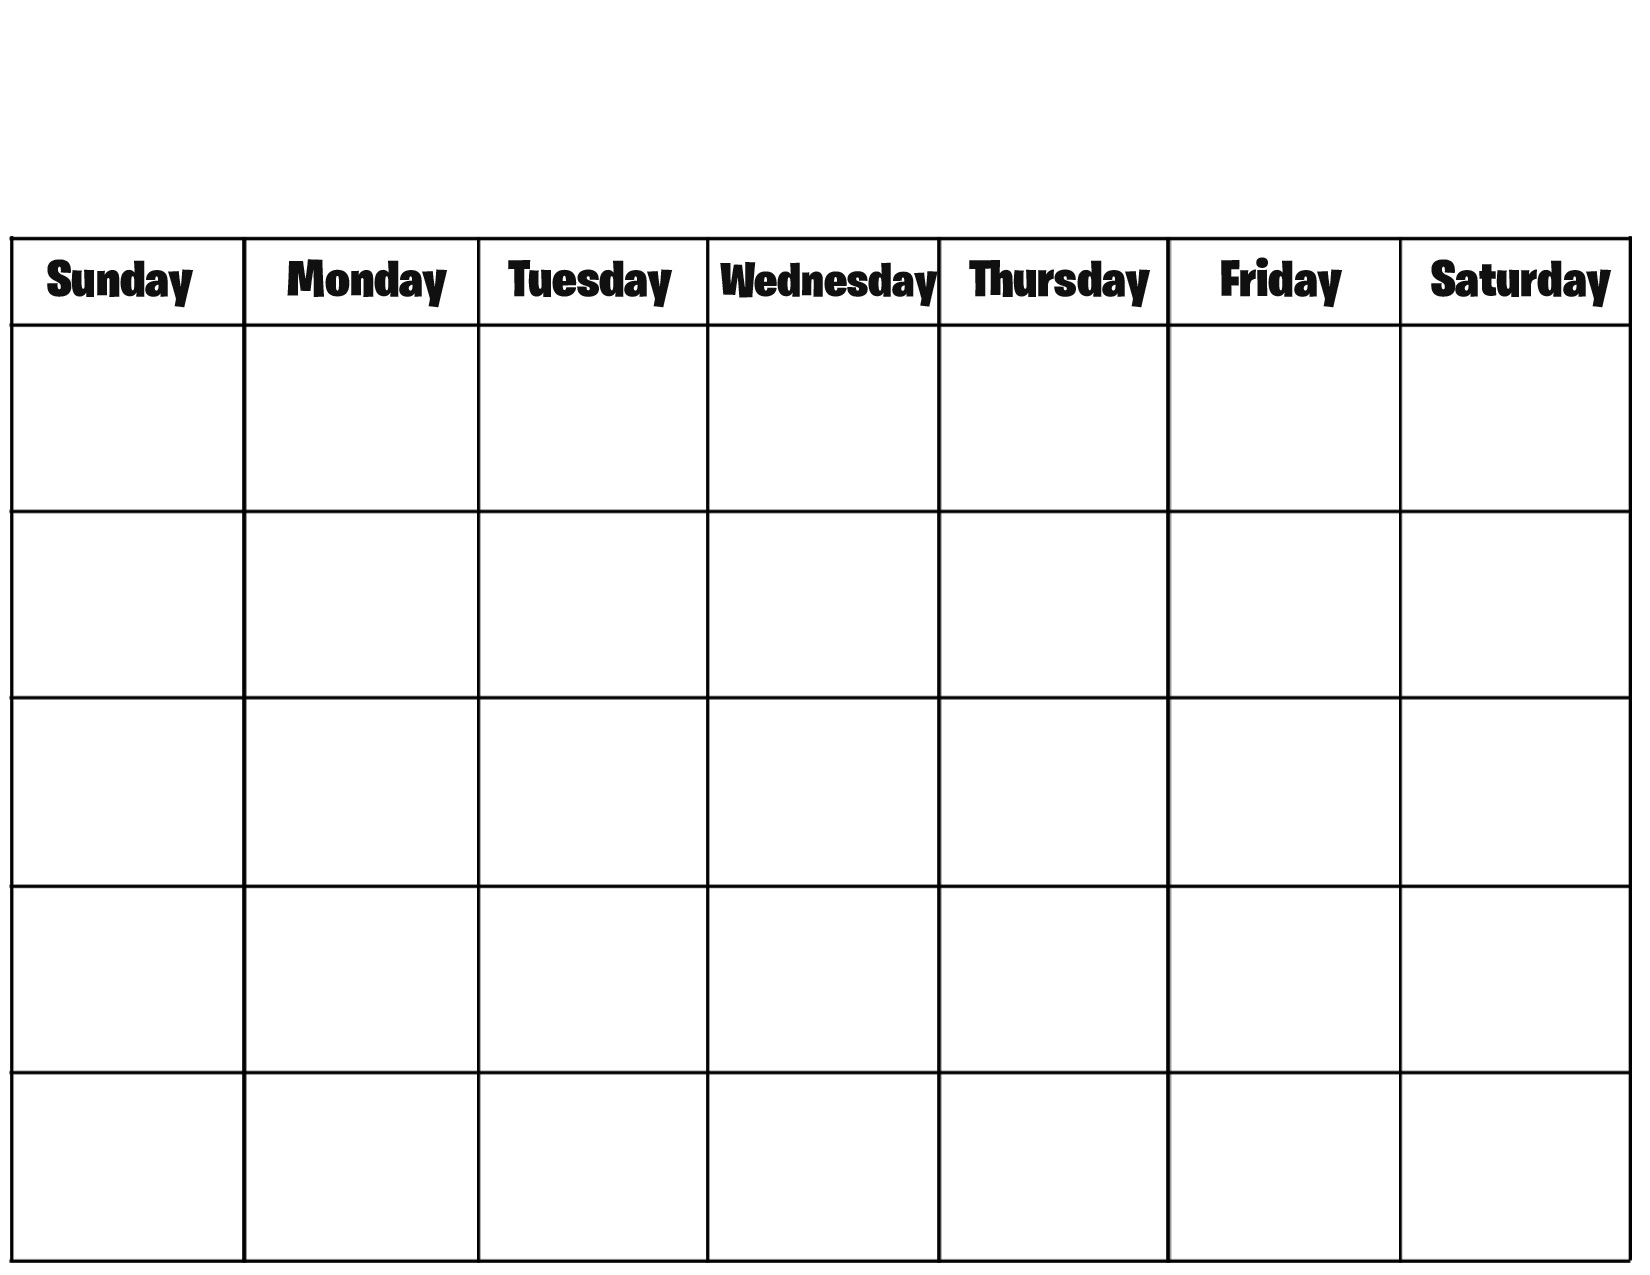 Calendar Print Outs Insssrenterprisesco3abry